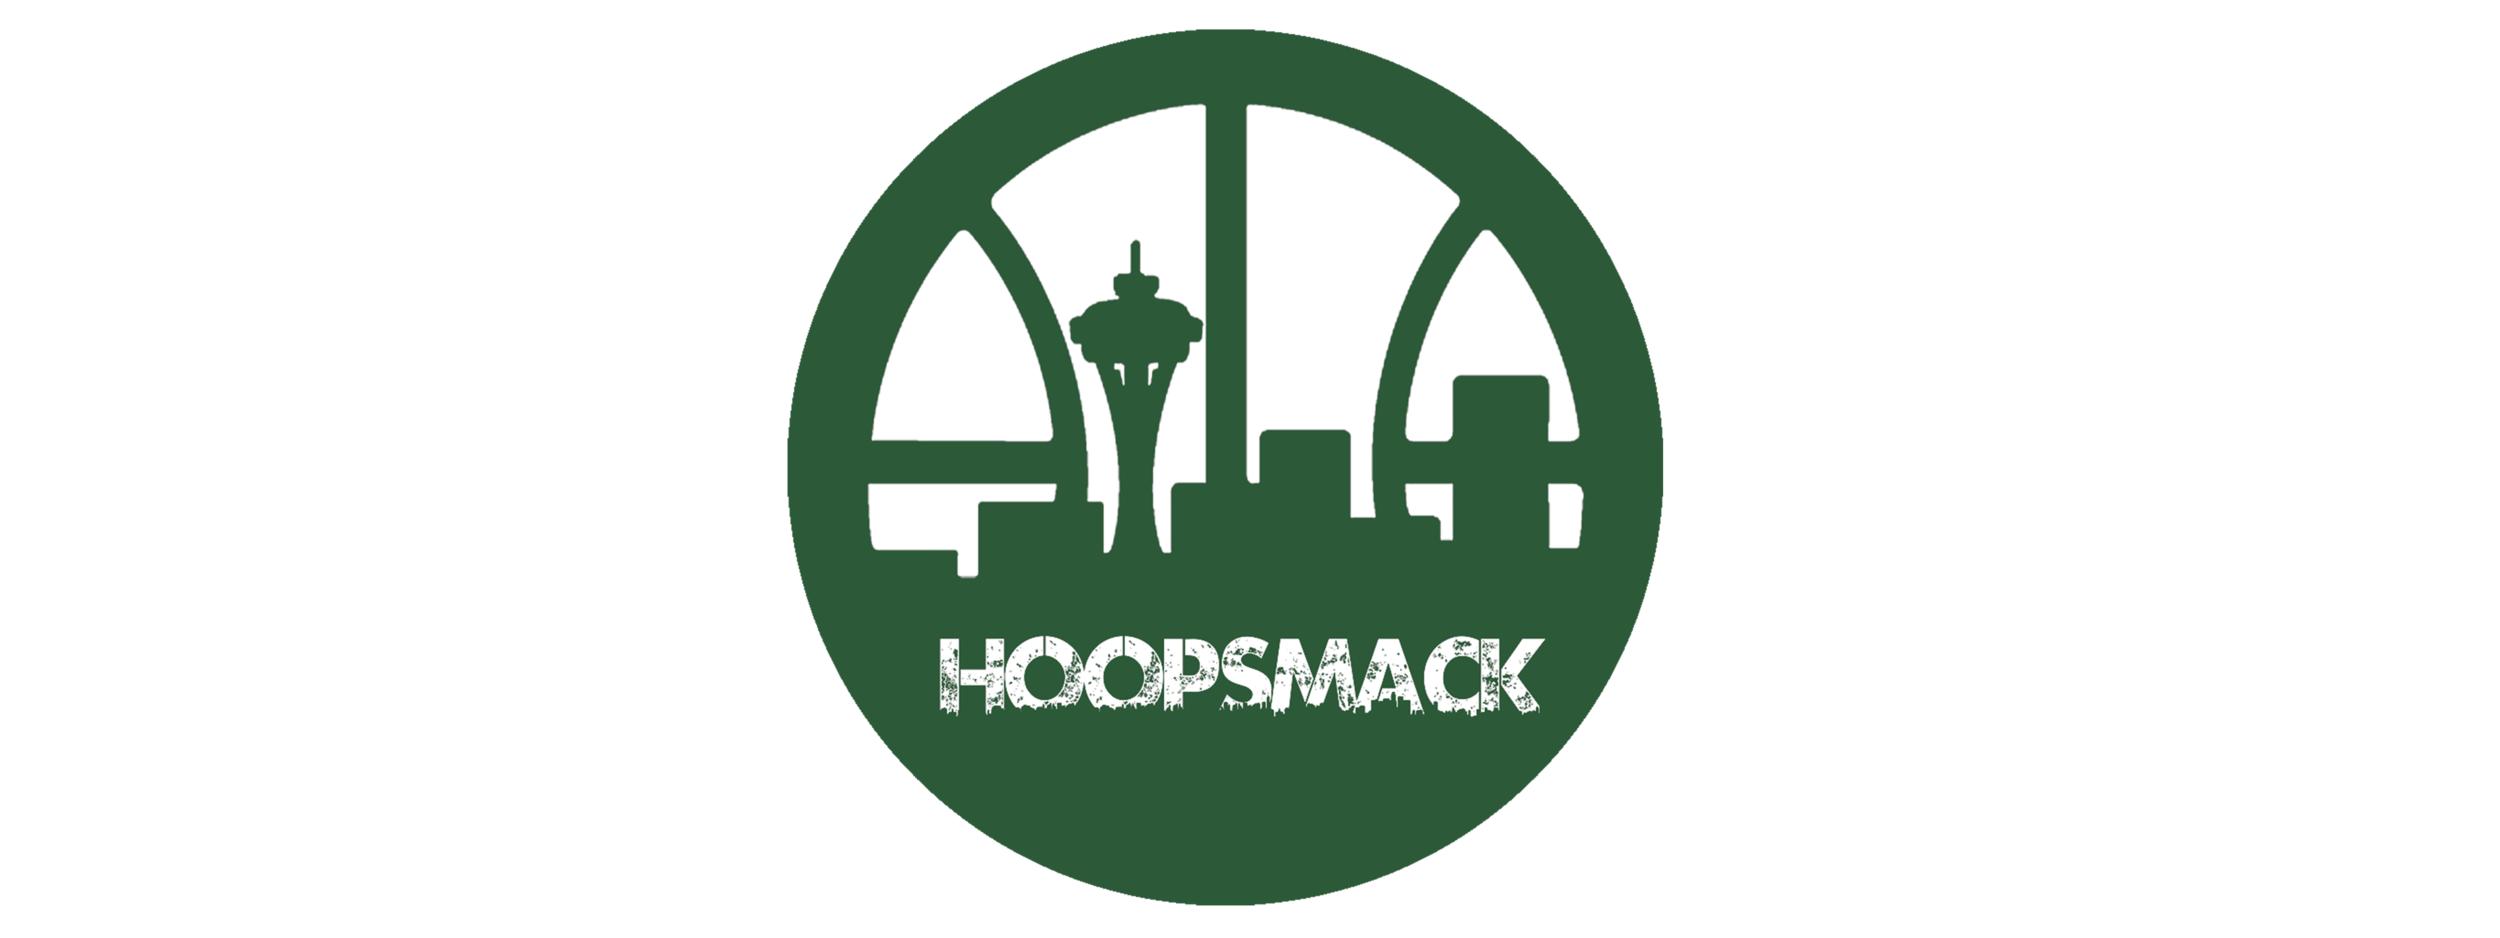 Hoopsmack.png